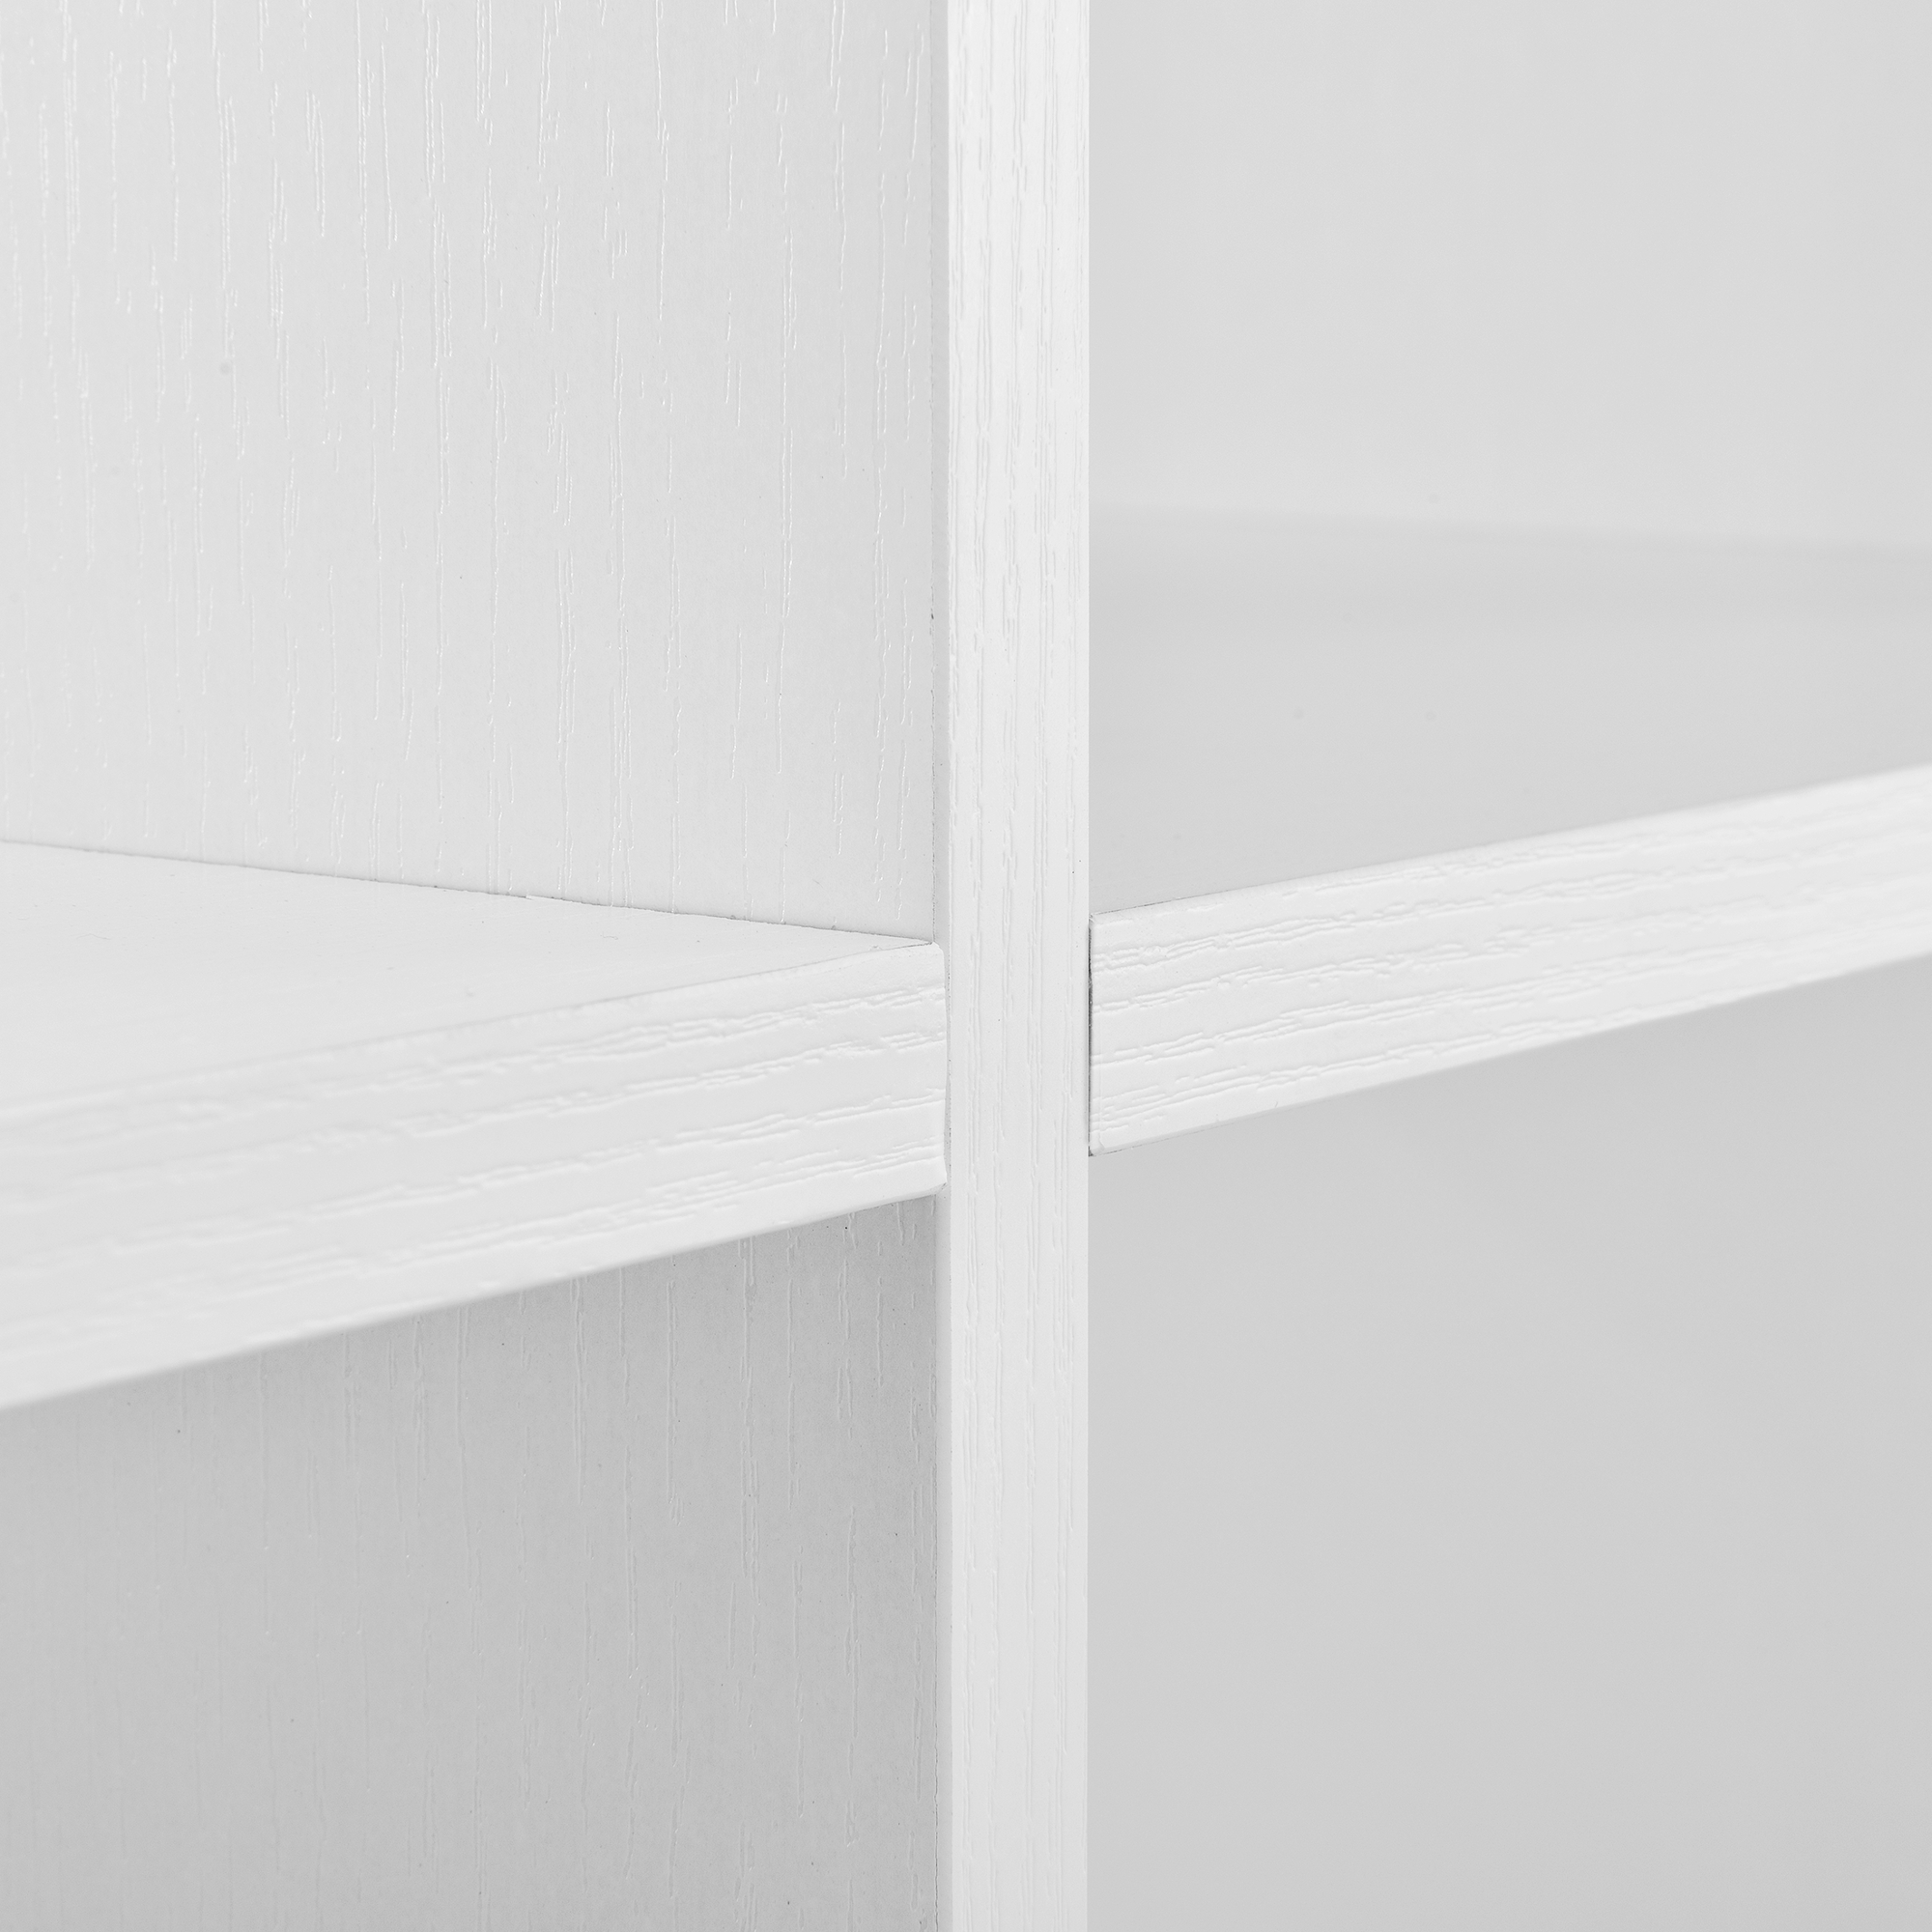 tag re escalier avec 10 casiers mdf m lamin 138 x 142 x 29cm blanc ebay. Black Bedroom Furniture Sets. Home Design Ideas